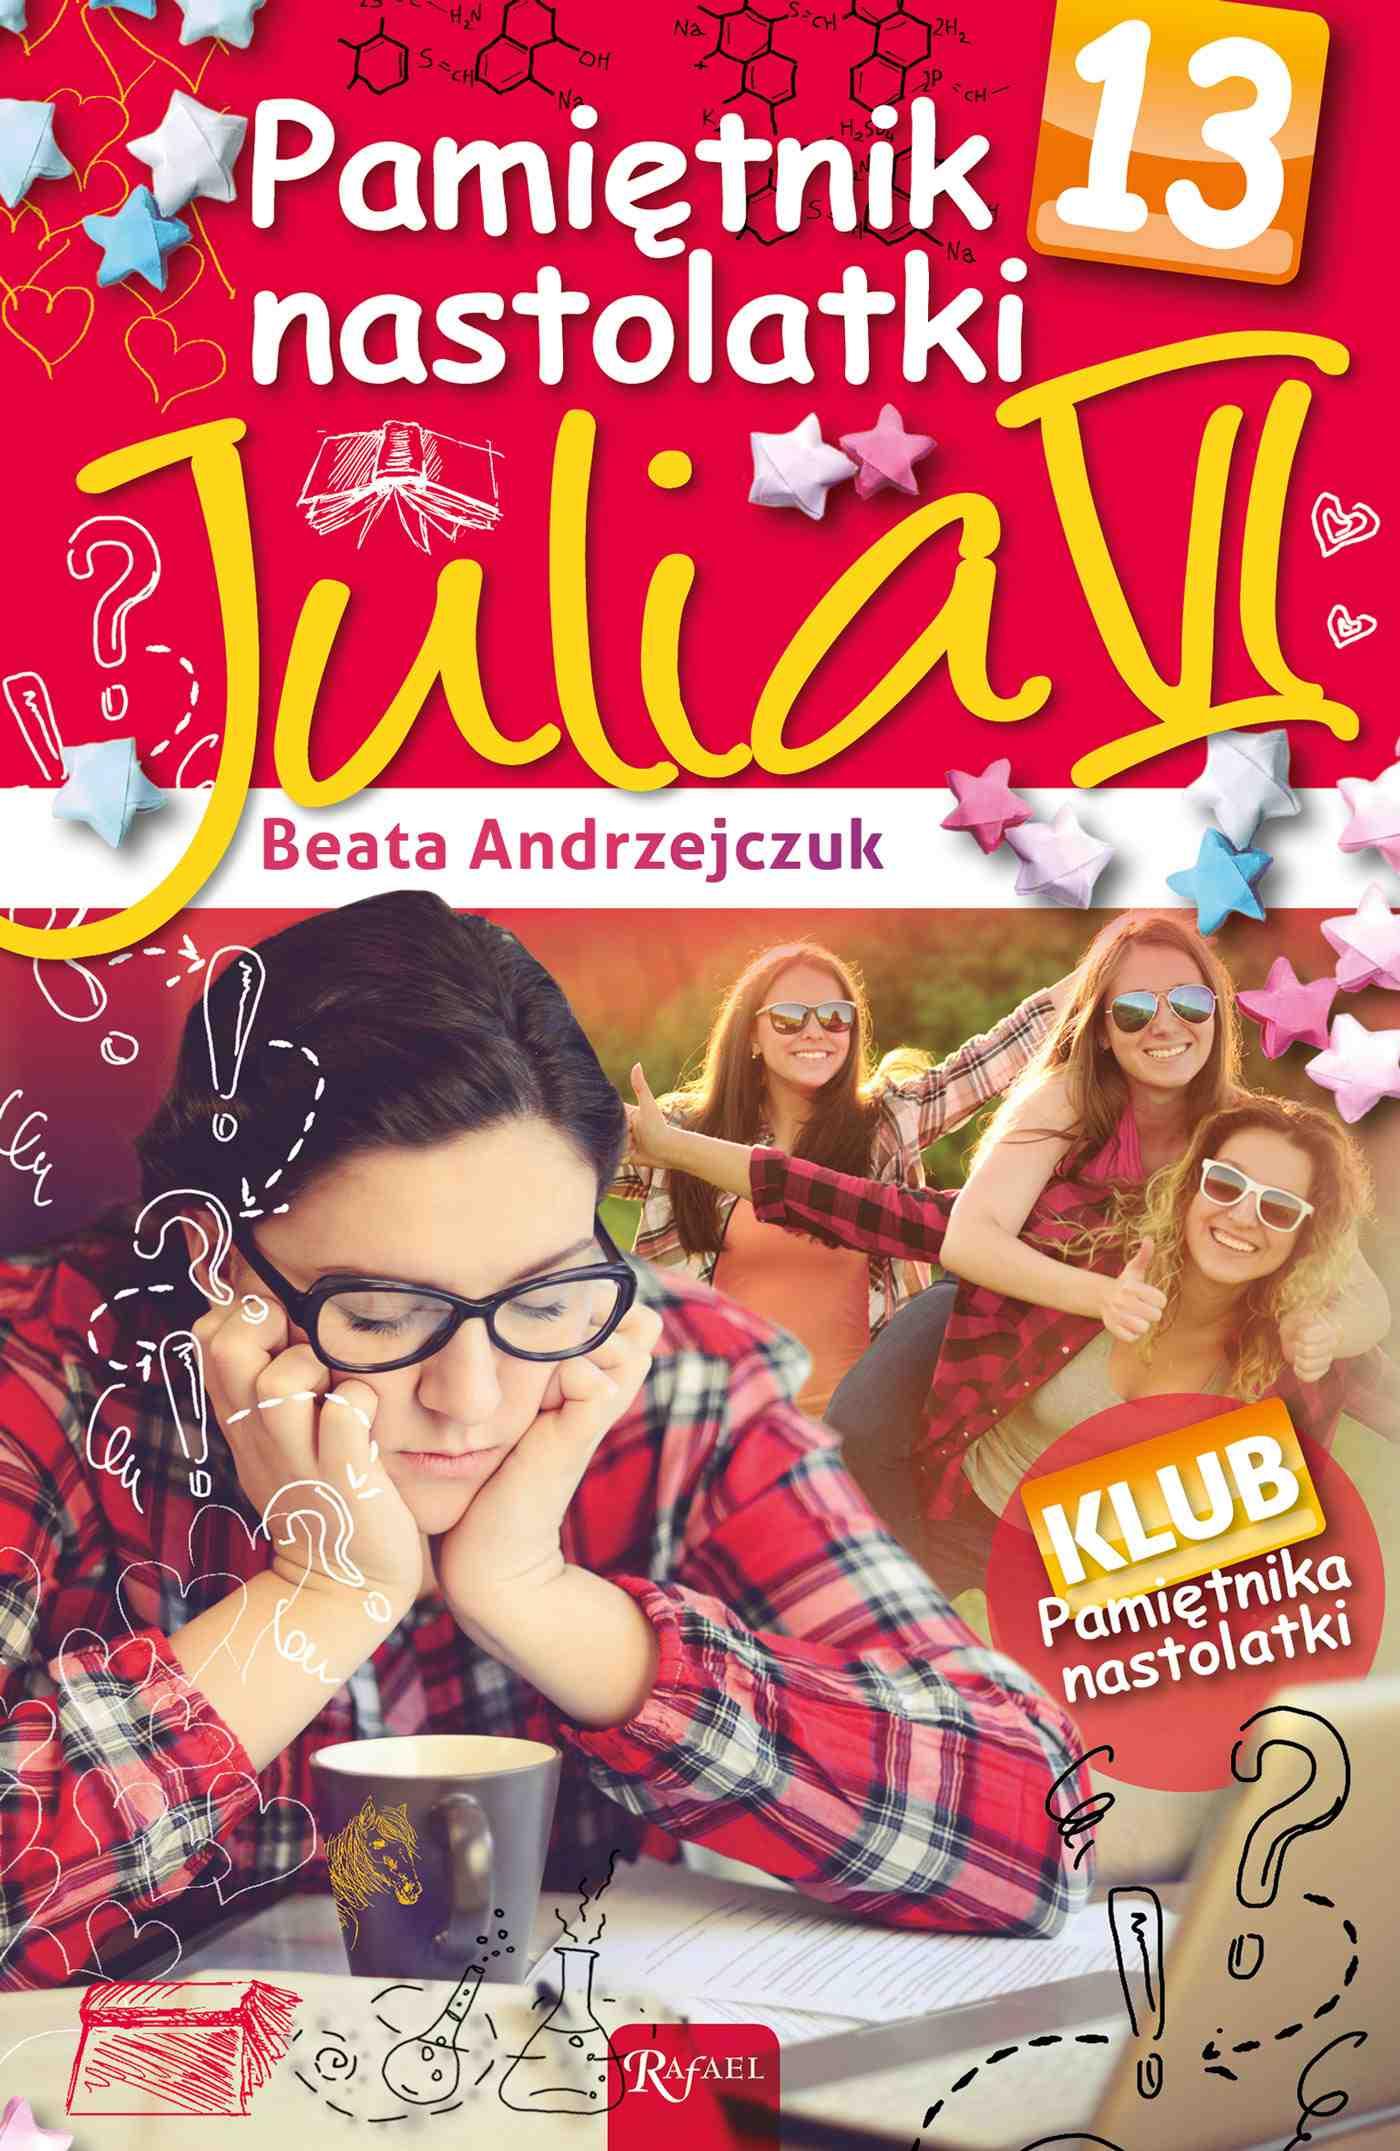 Pamiętnik nastolatki 13. Julia VI - Ebook (Książka na Kindle) do pobrania w formacie MOBI